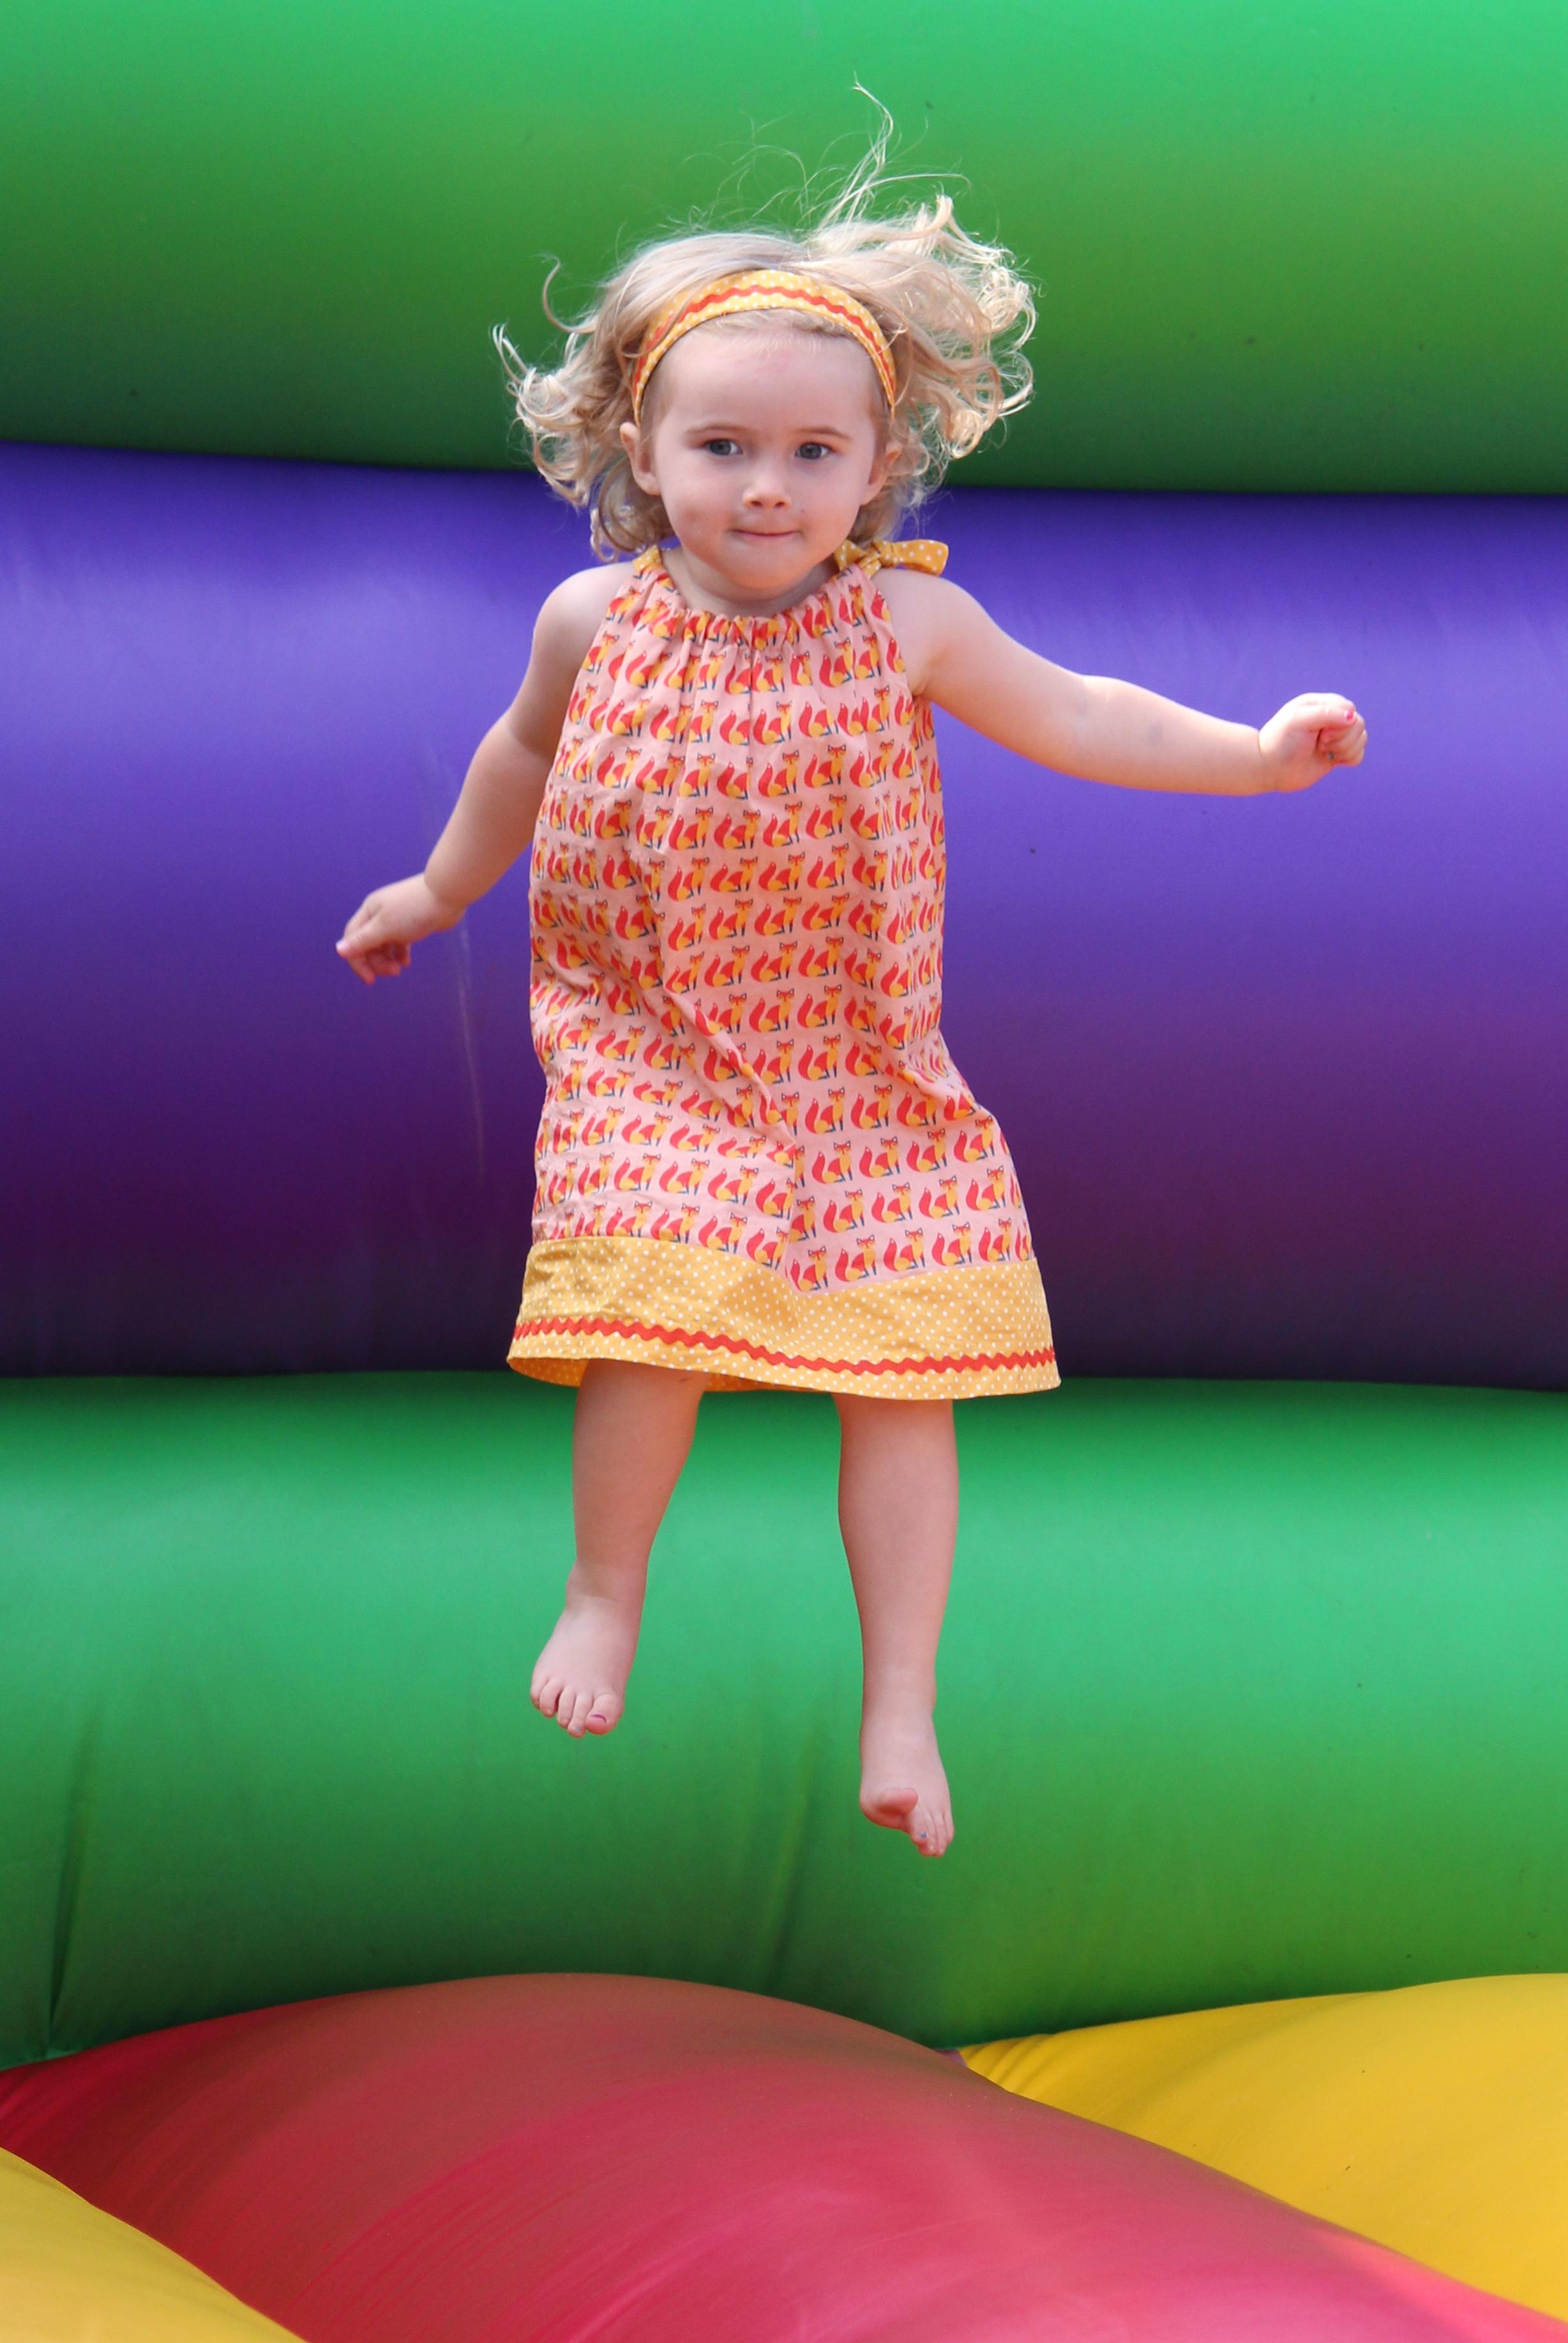 bouncy-castle-craftygoat